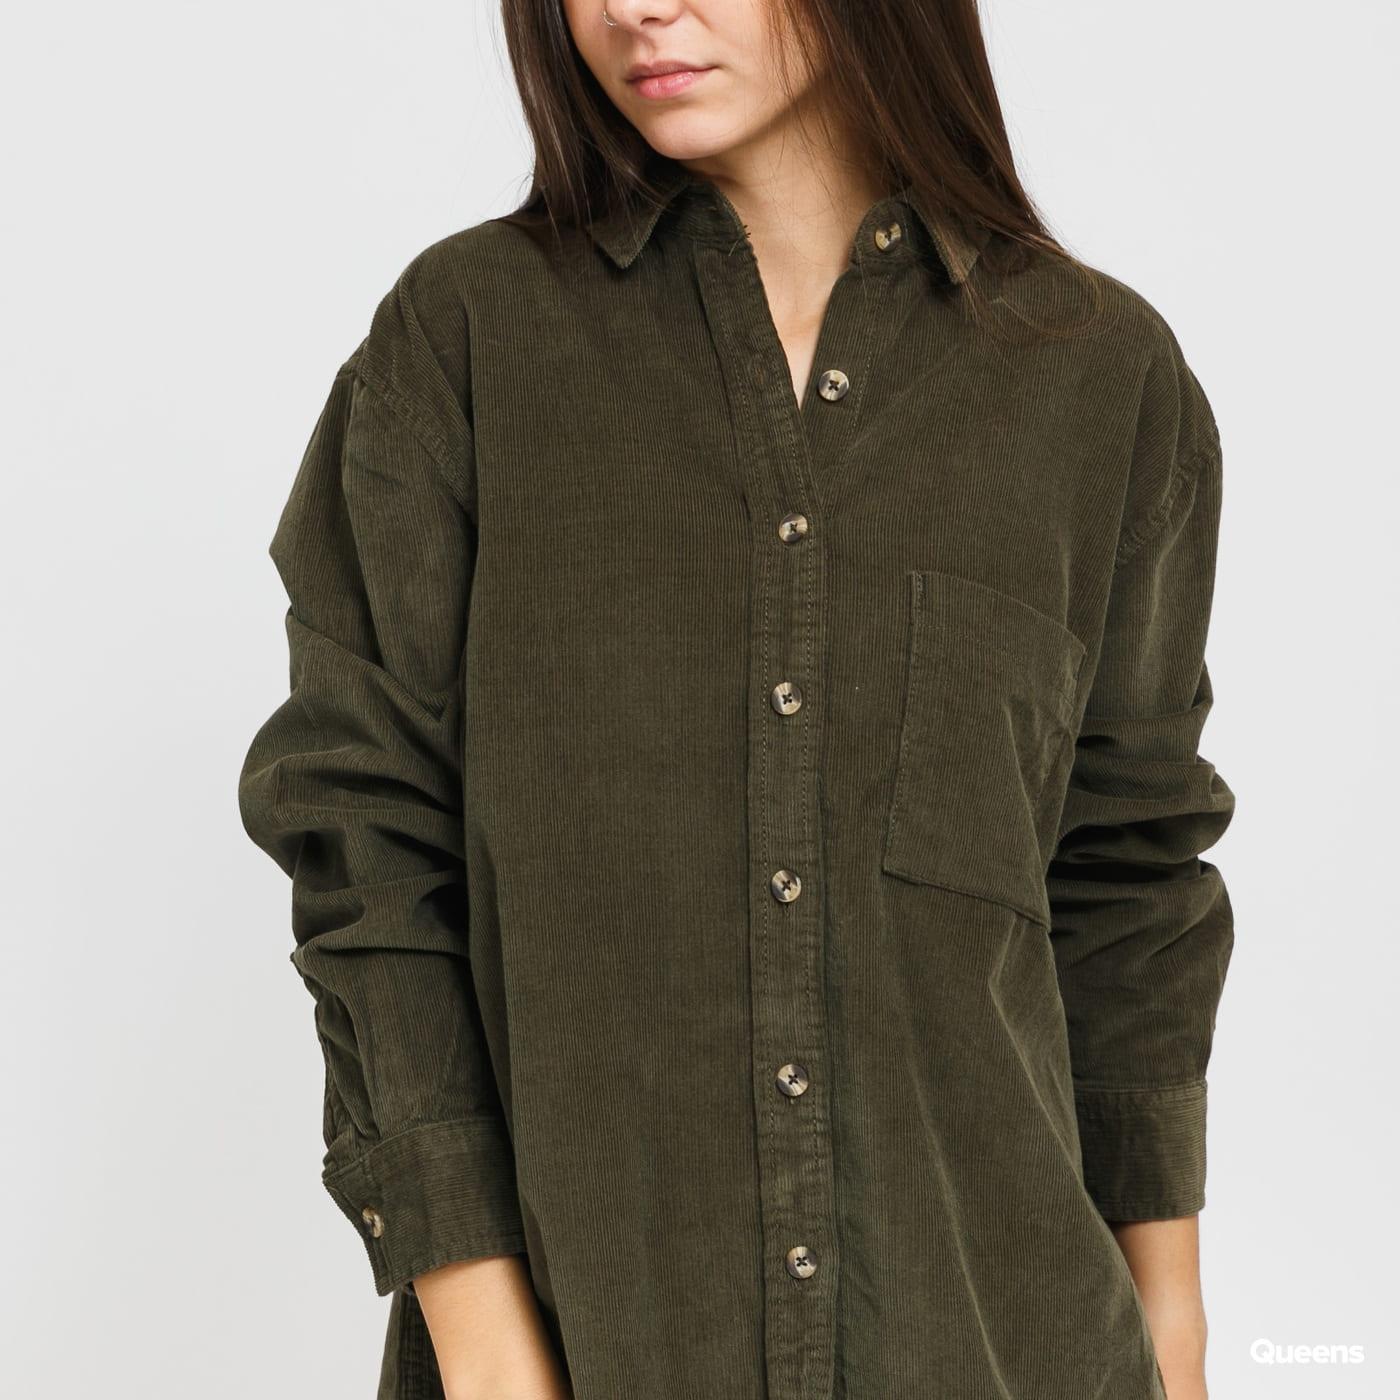 Urban Classics Ladies Corduroy Oversized Shirt olive